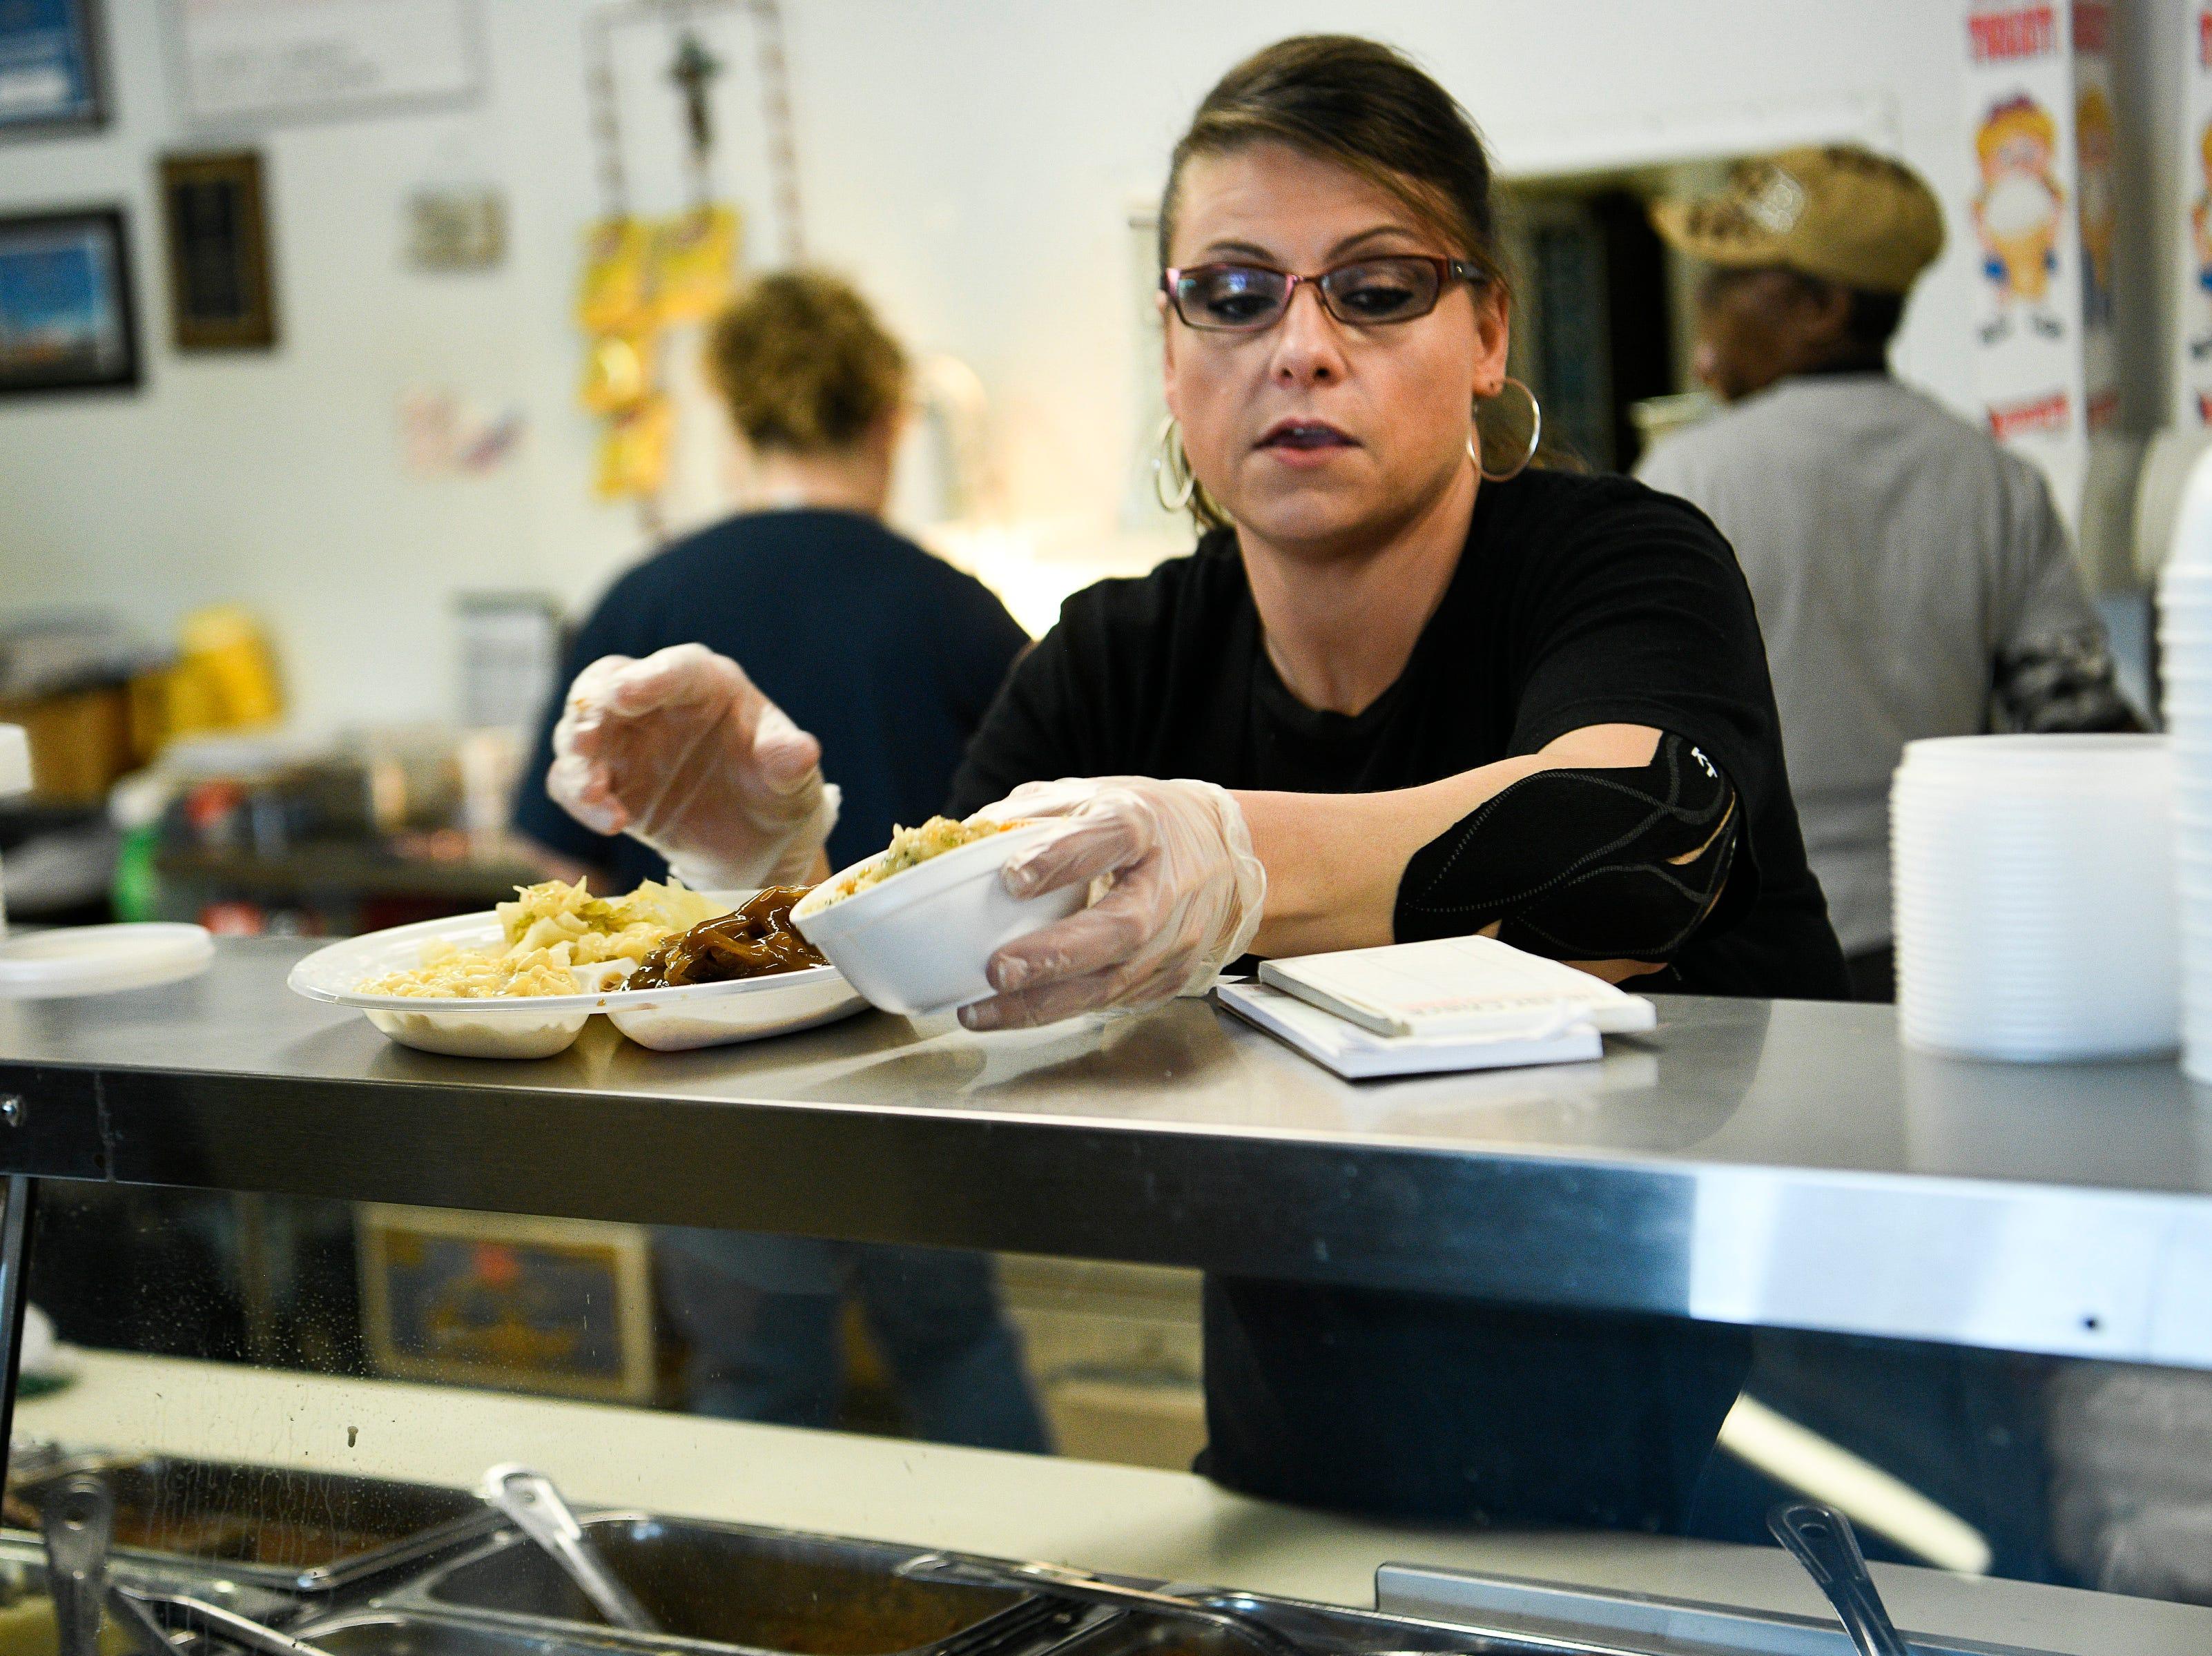 Bobbie Jo Allardice serves food to customers at Dairy King  Wednesday Jan. 30, 2019 in Nashville, Tenn.